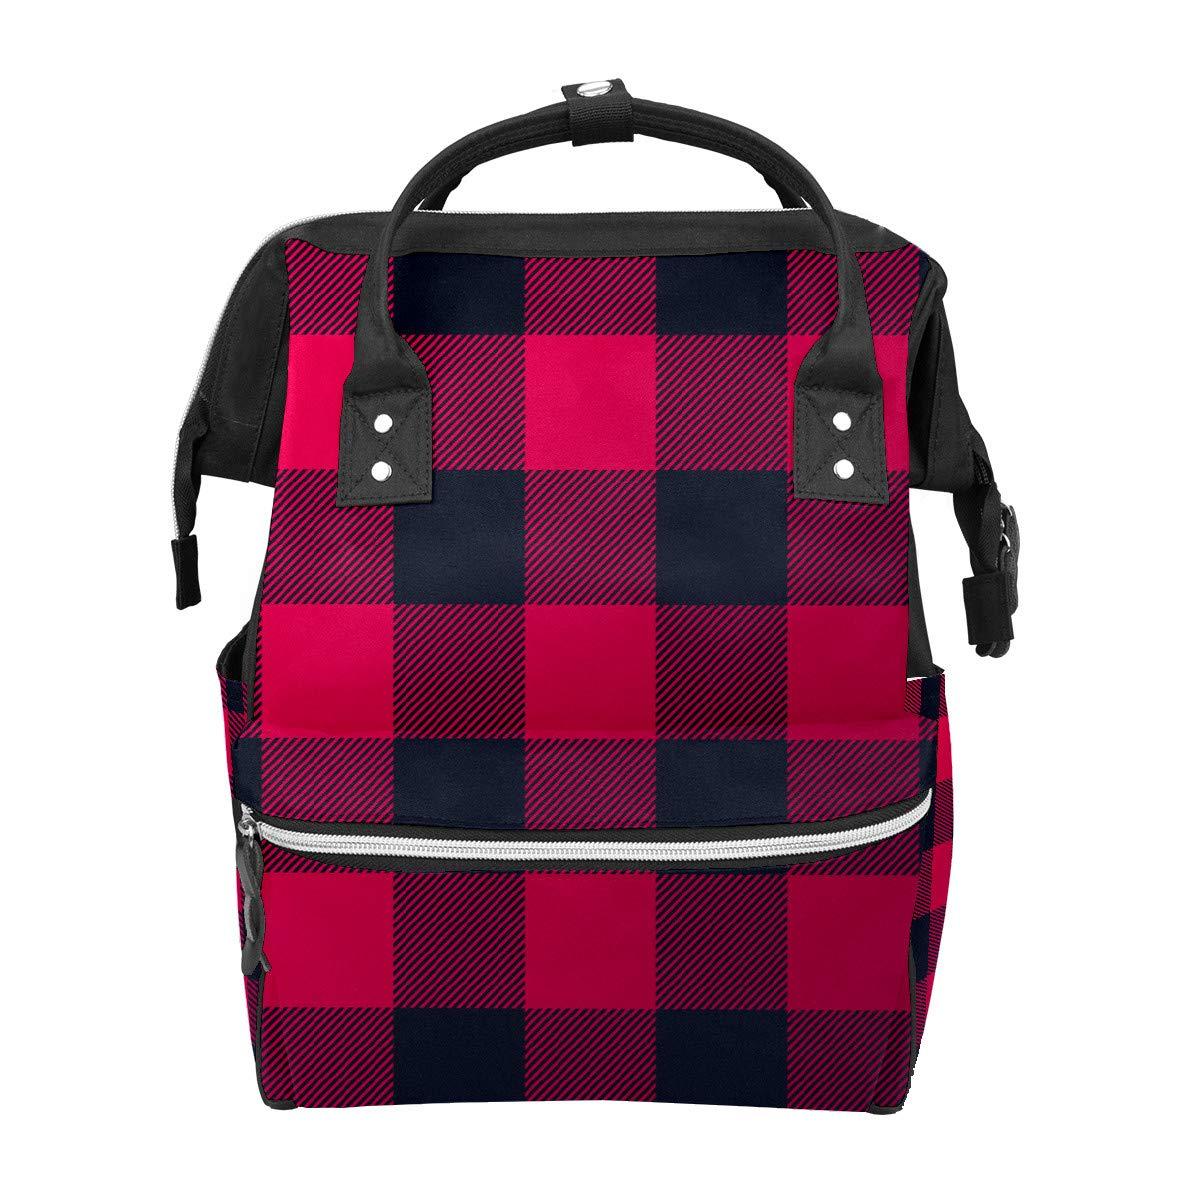 Diaper Bag Backpack Trendy Lumberjack Pattern Multifunction Travel Back Pack Baby Changing Bags Large Capacity Waterproof Stylish